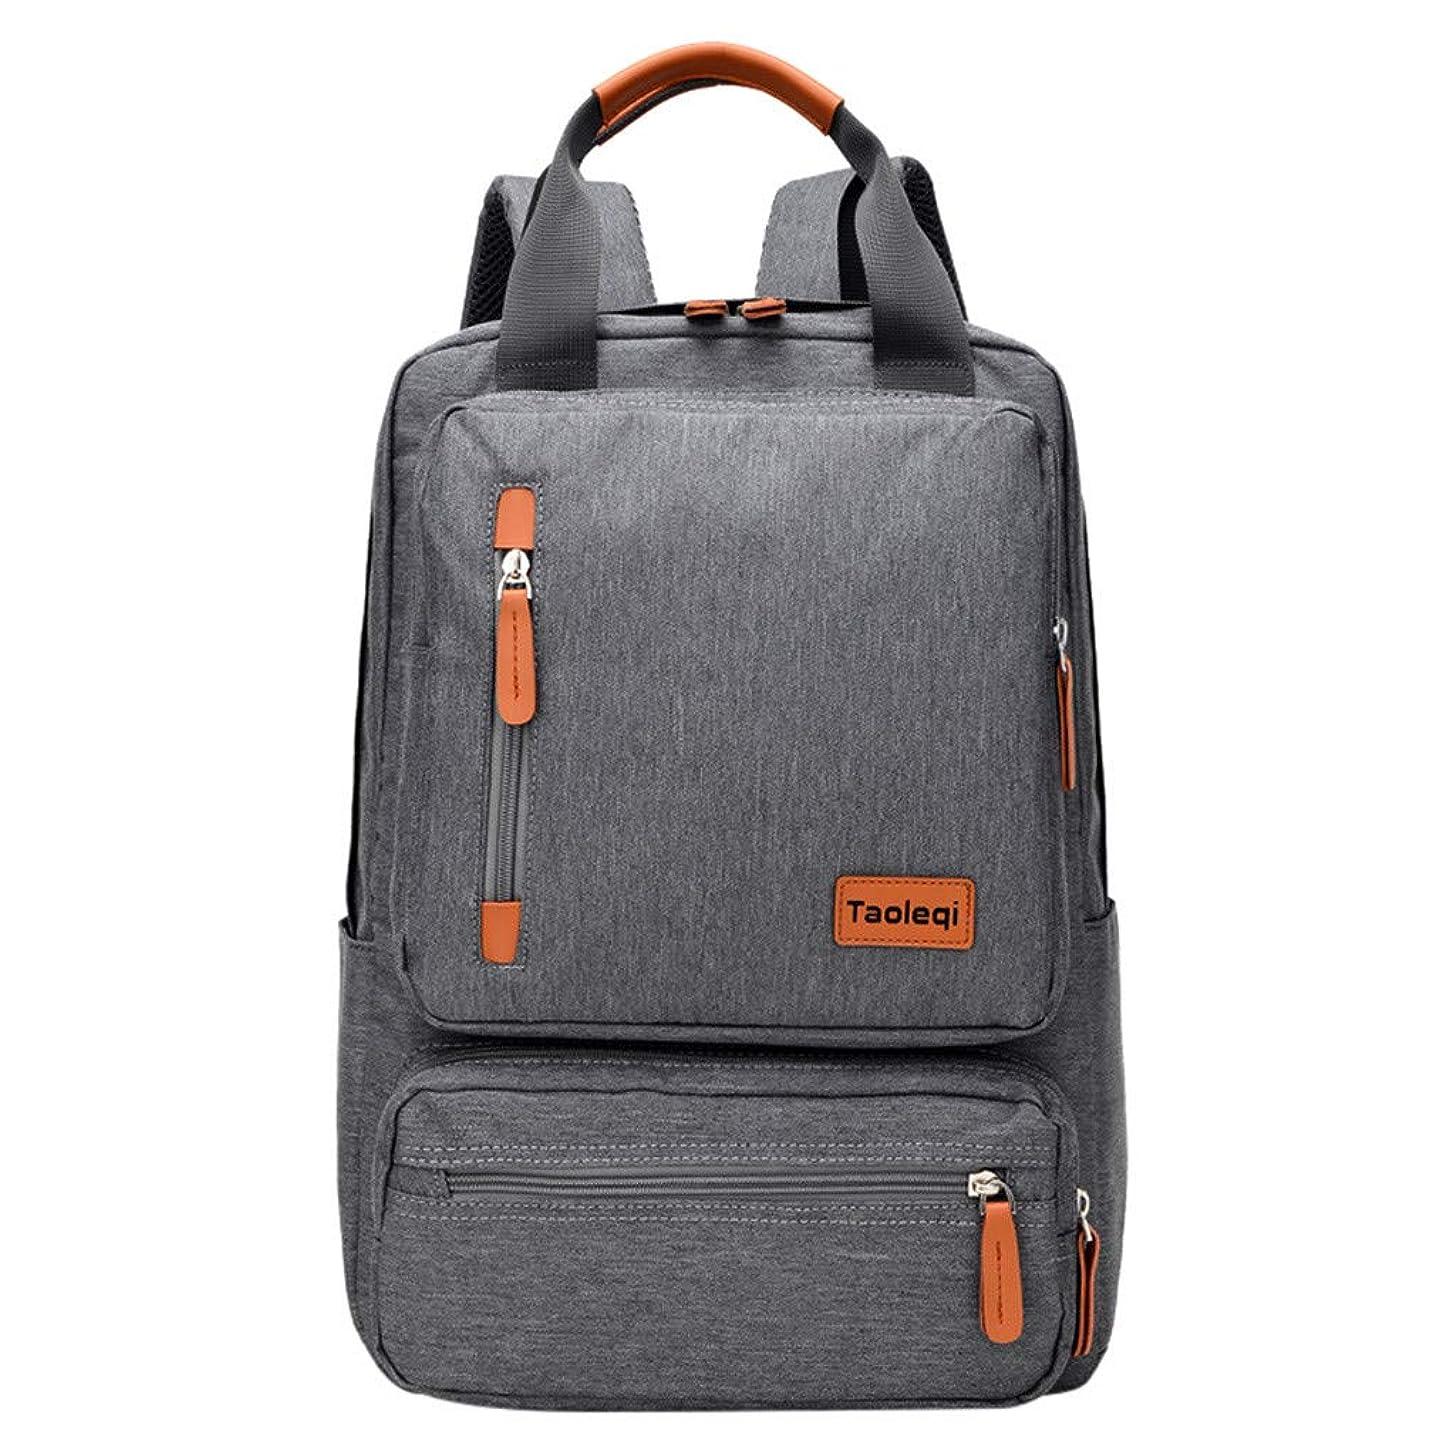 Tronet Travel Backpack for Women,Couple Models Canvas Backpack Portable Multi-Function Student Bag Travel Bag